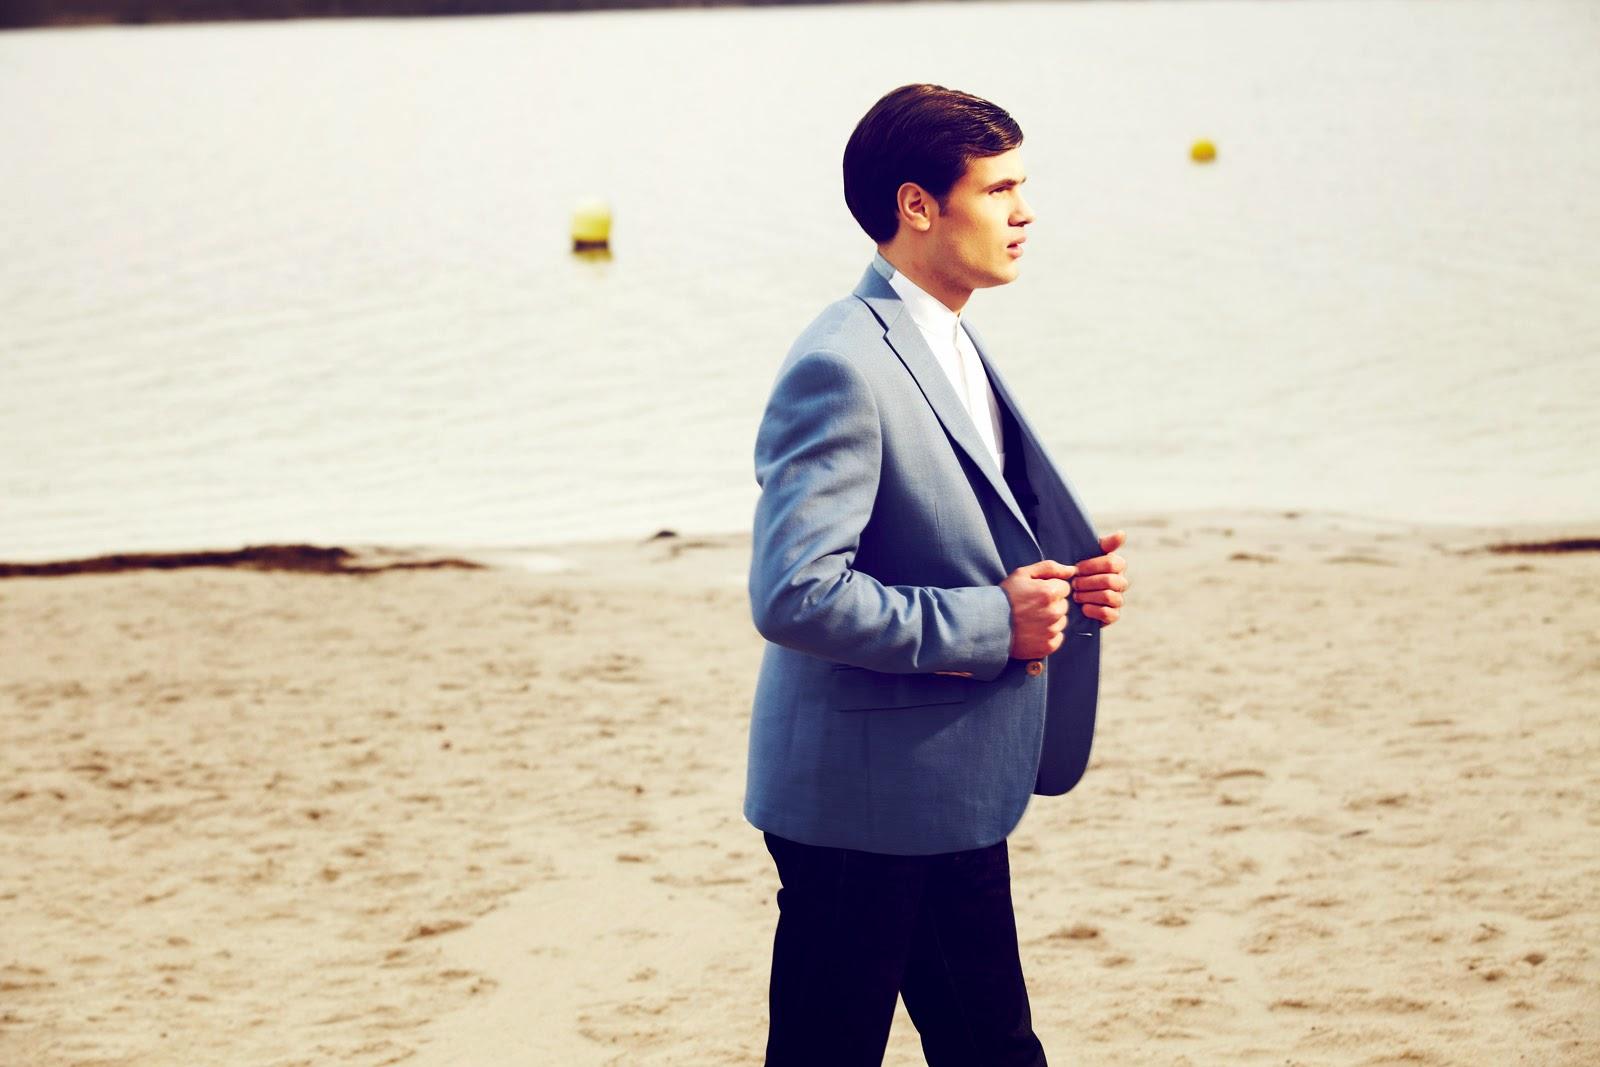 Cavalier Bleu, moda hombre, Made in France, moda masculina, menswear, casual, Suits and Shirts, Spring 2015, primavera verano,